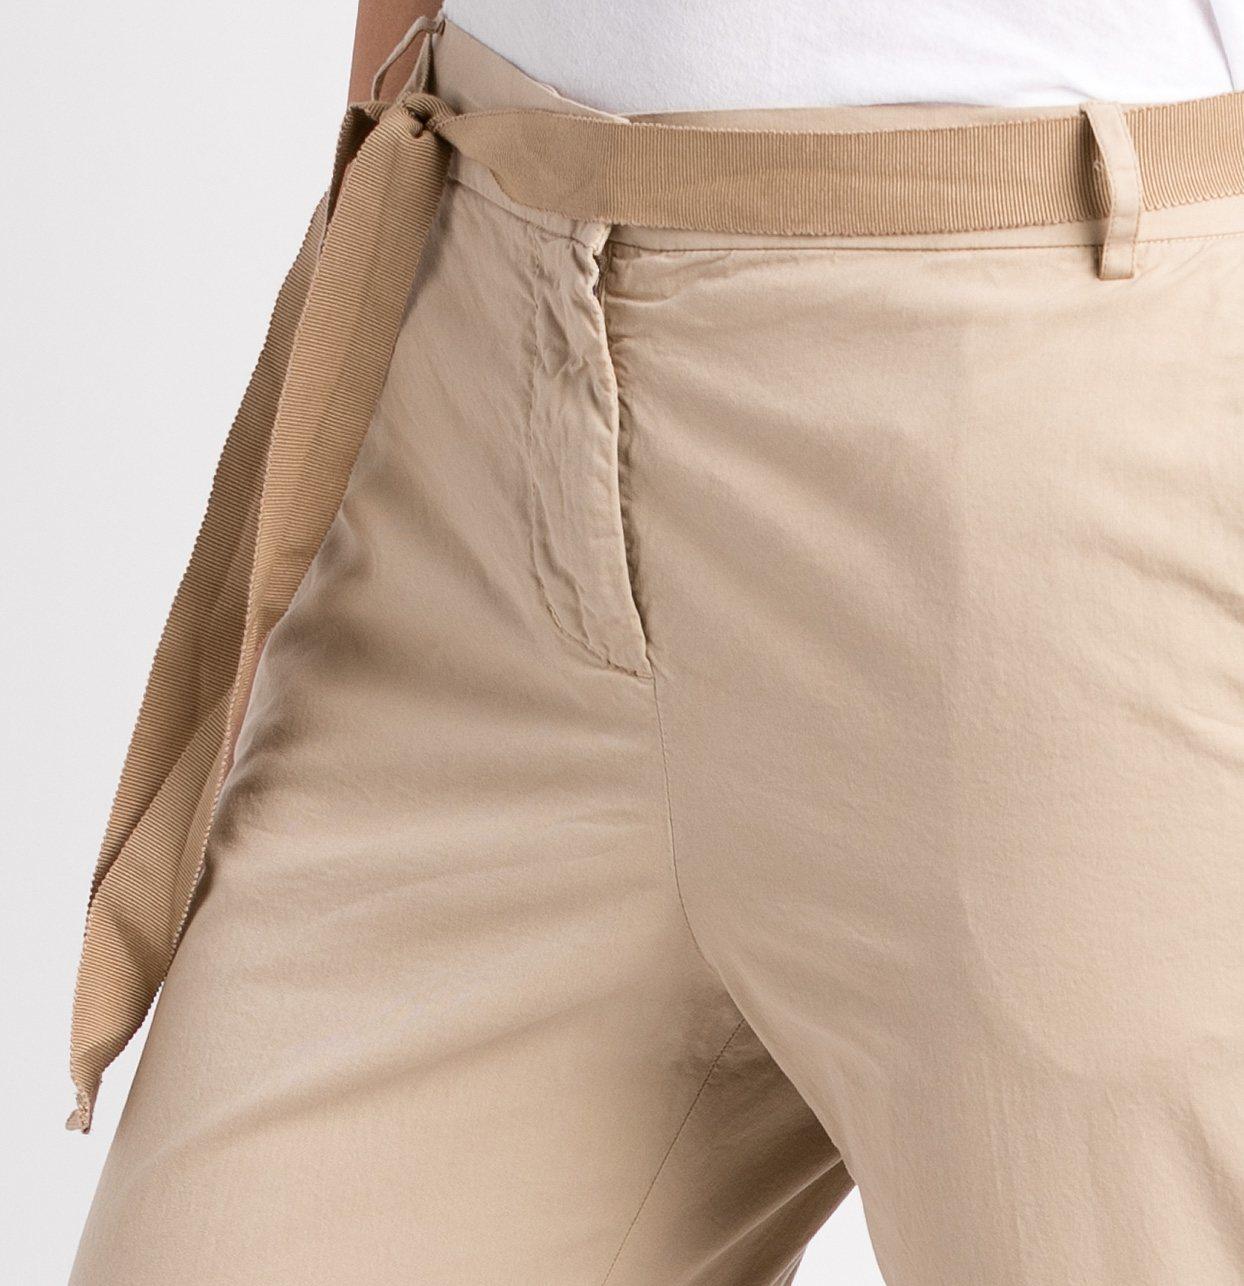 Pantalón soft woman modelo PAPILLON color beige. - Ítem1